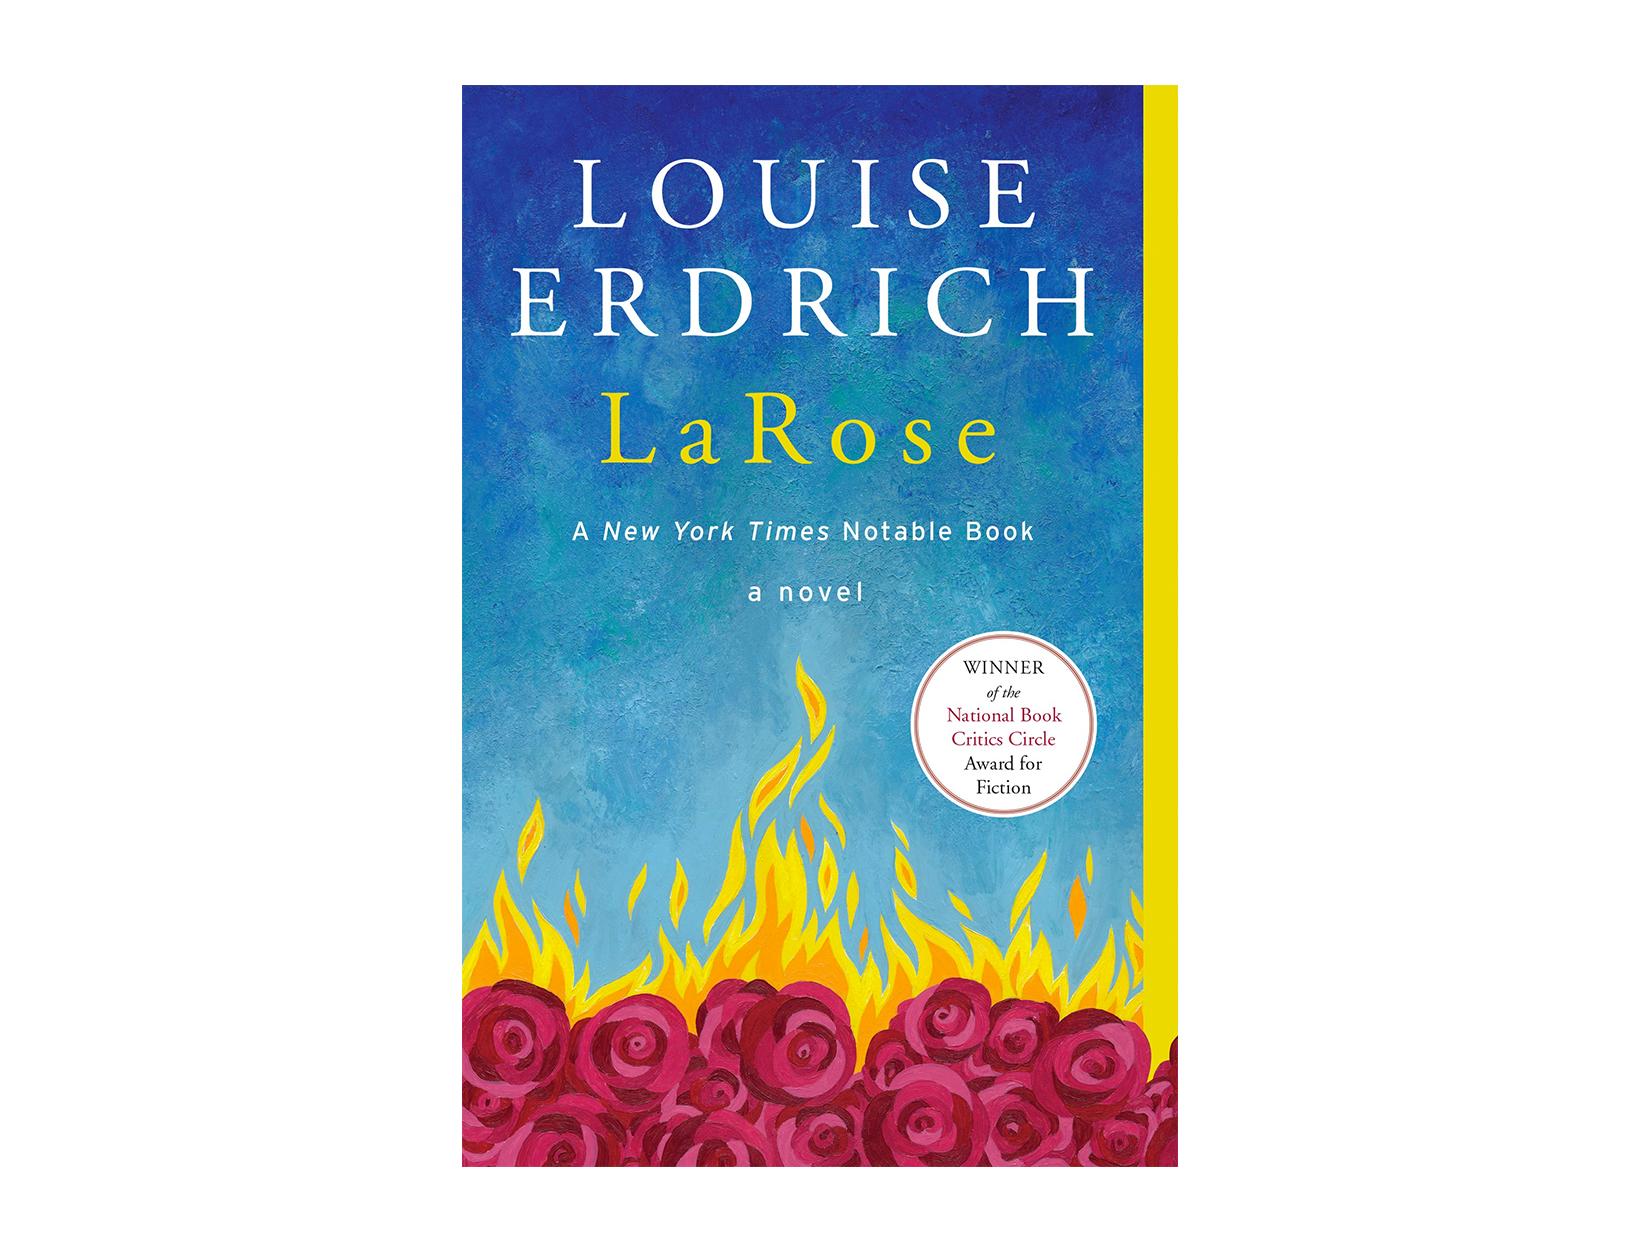 LaRose by Louise Edrich